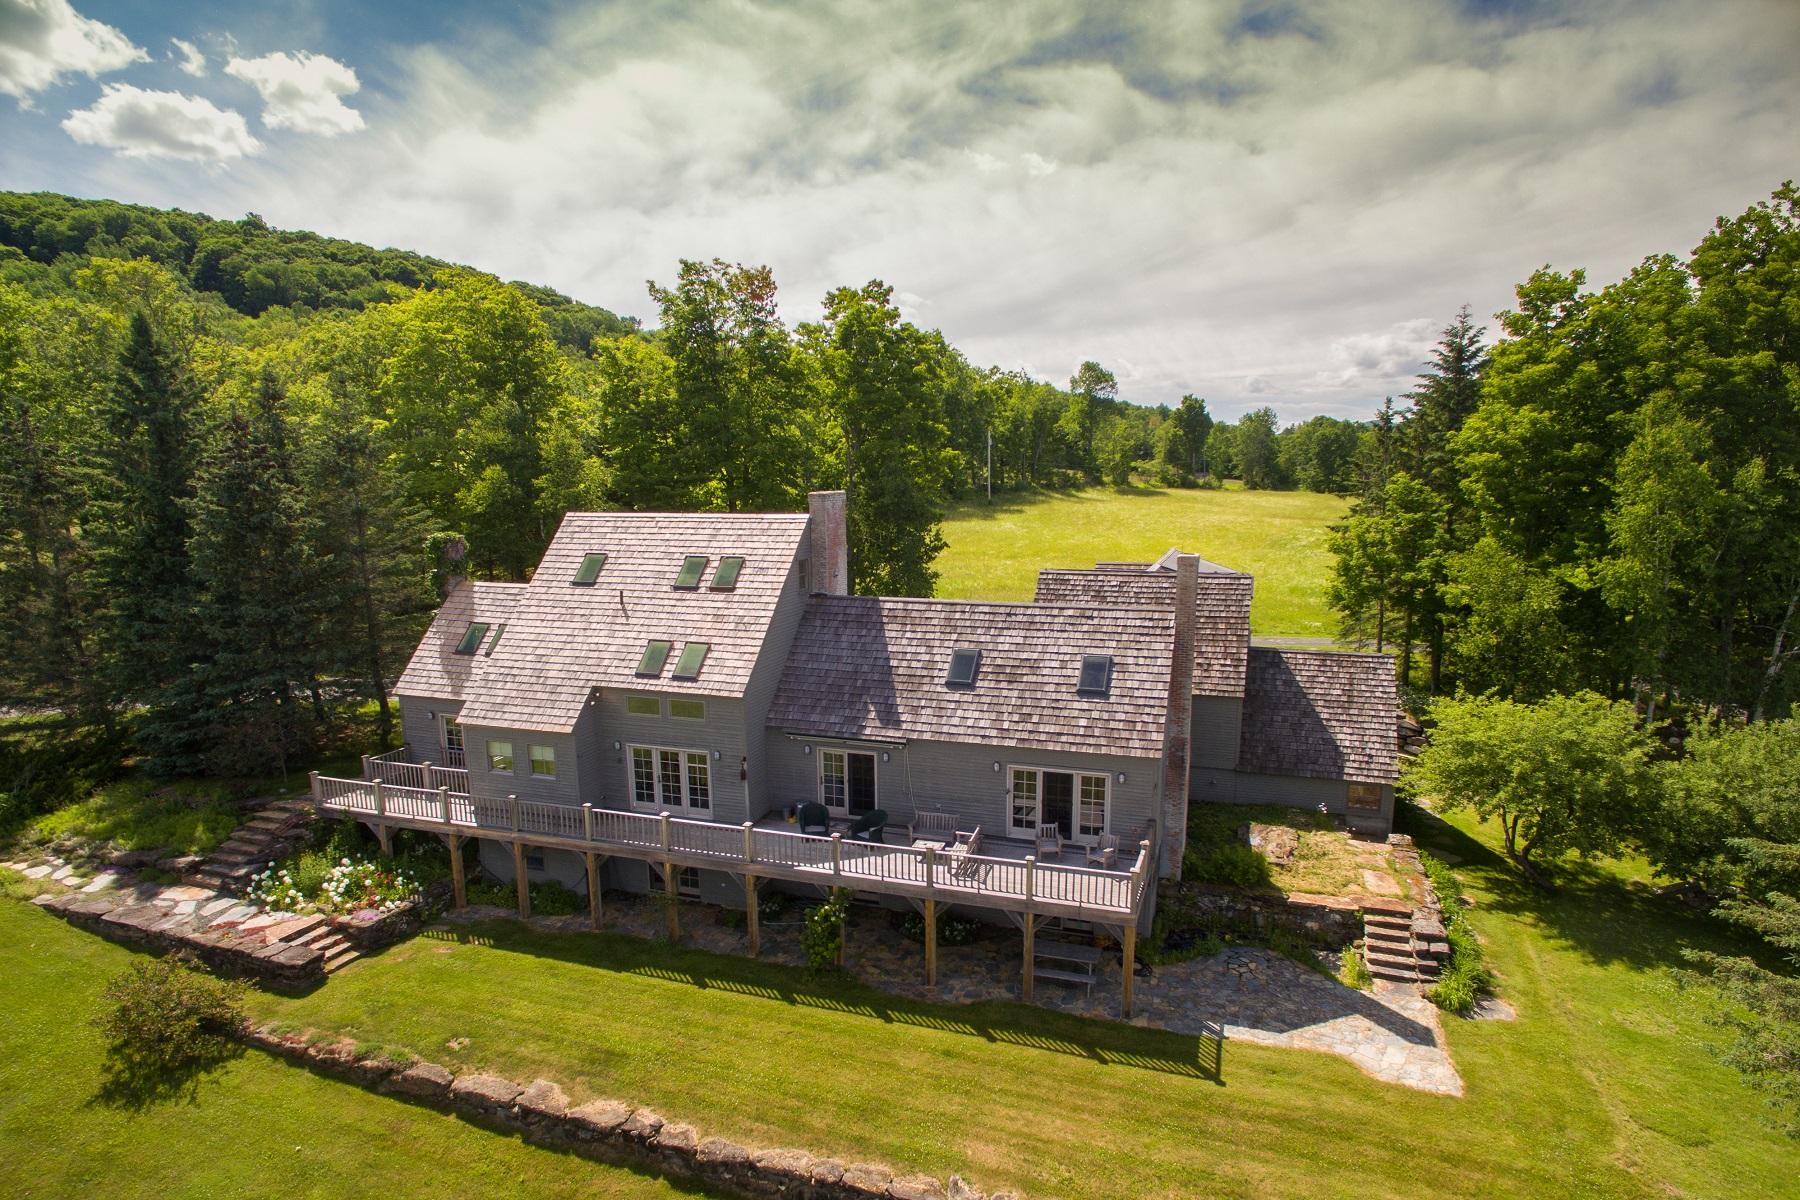 獨棟家庭住宅 為 出售 在 Upper Treehouse 1239 Peterkin Hill Road Woodstock, 佛蒙特州, 05091 美國